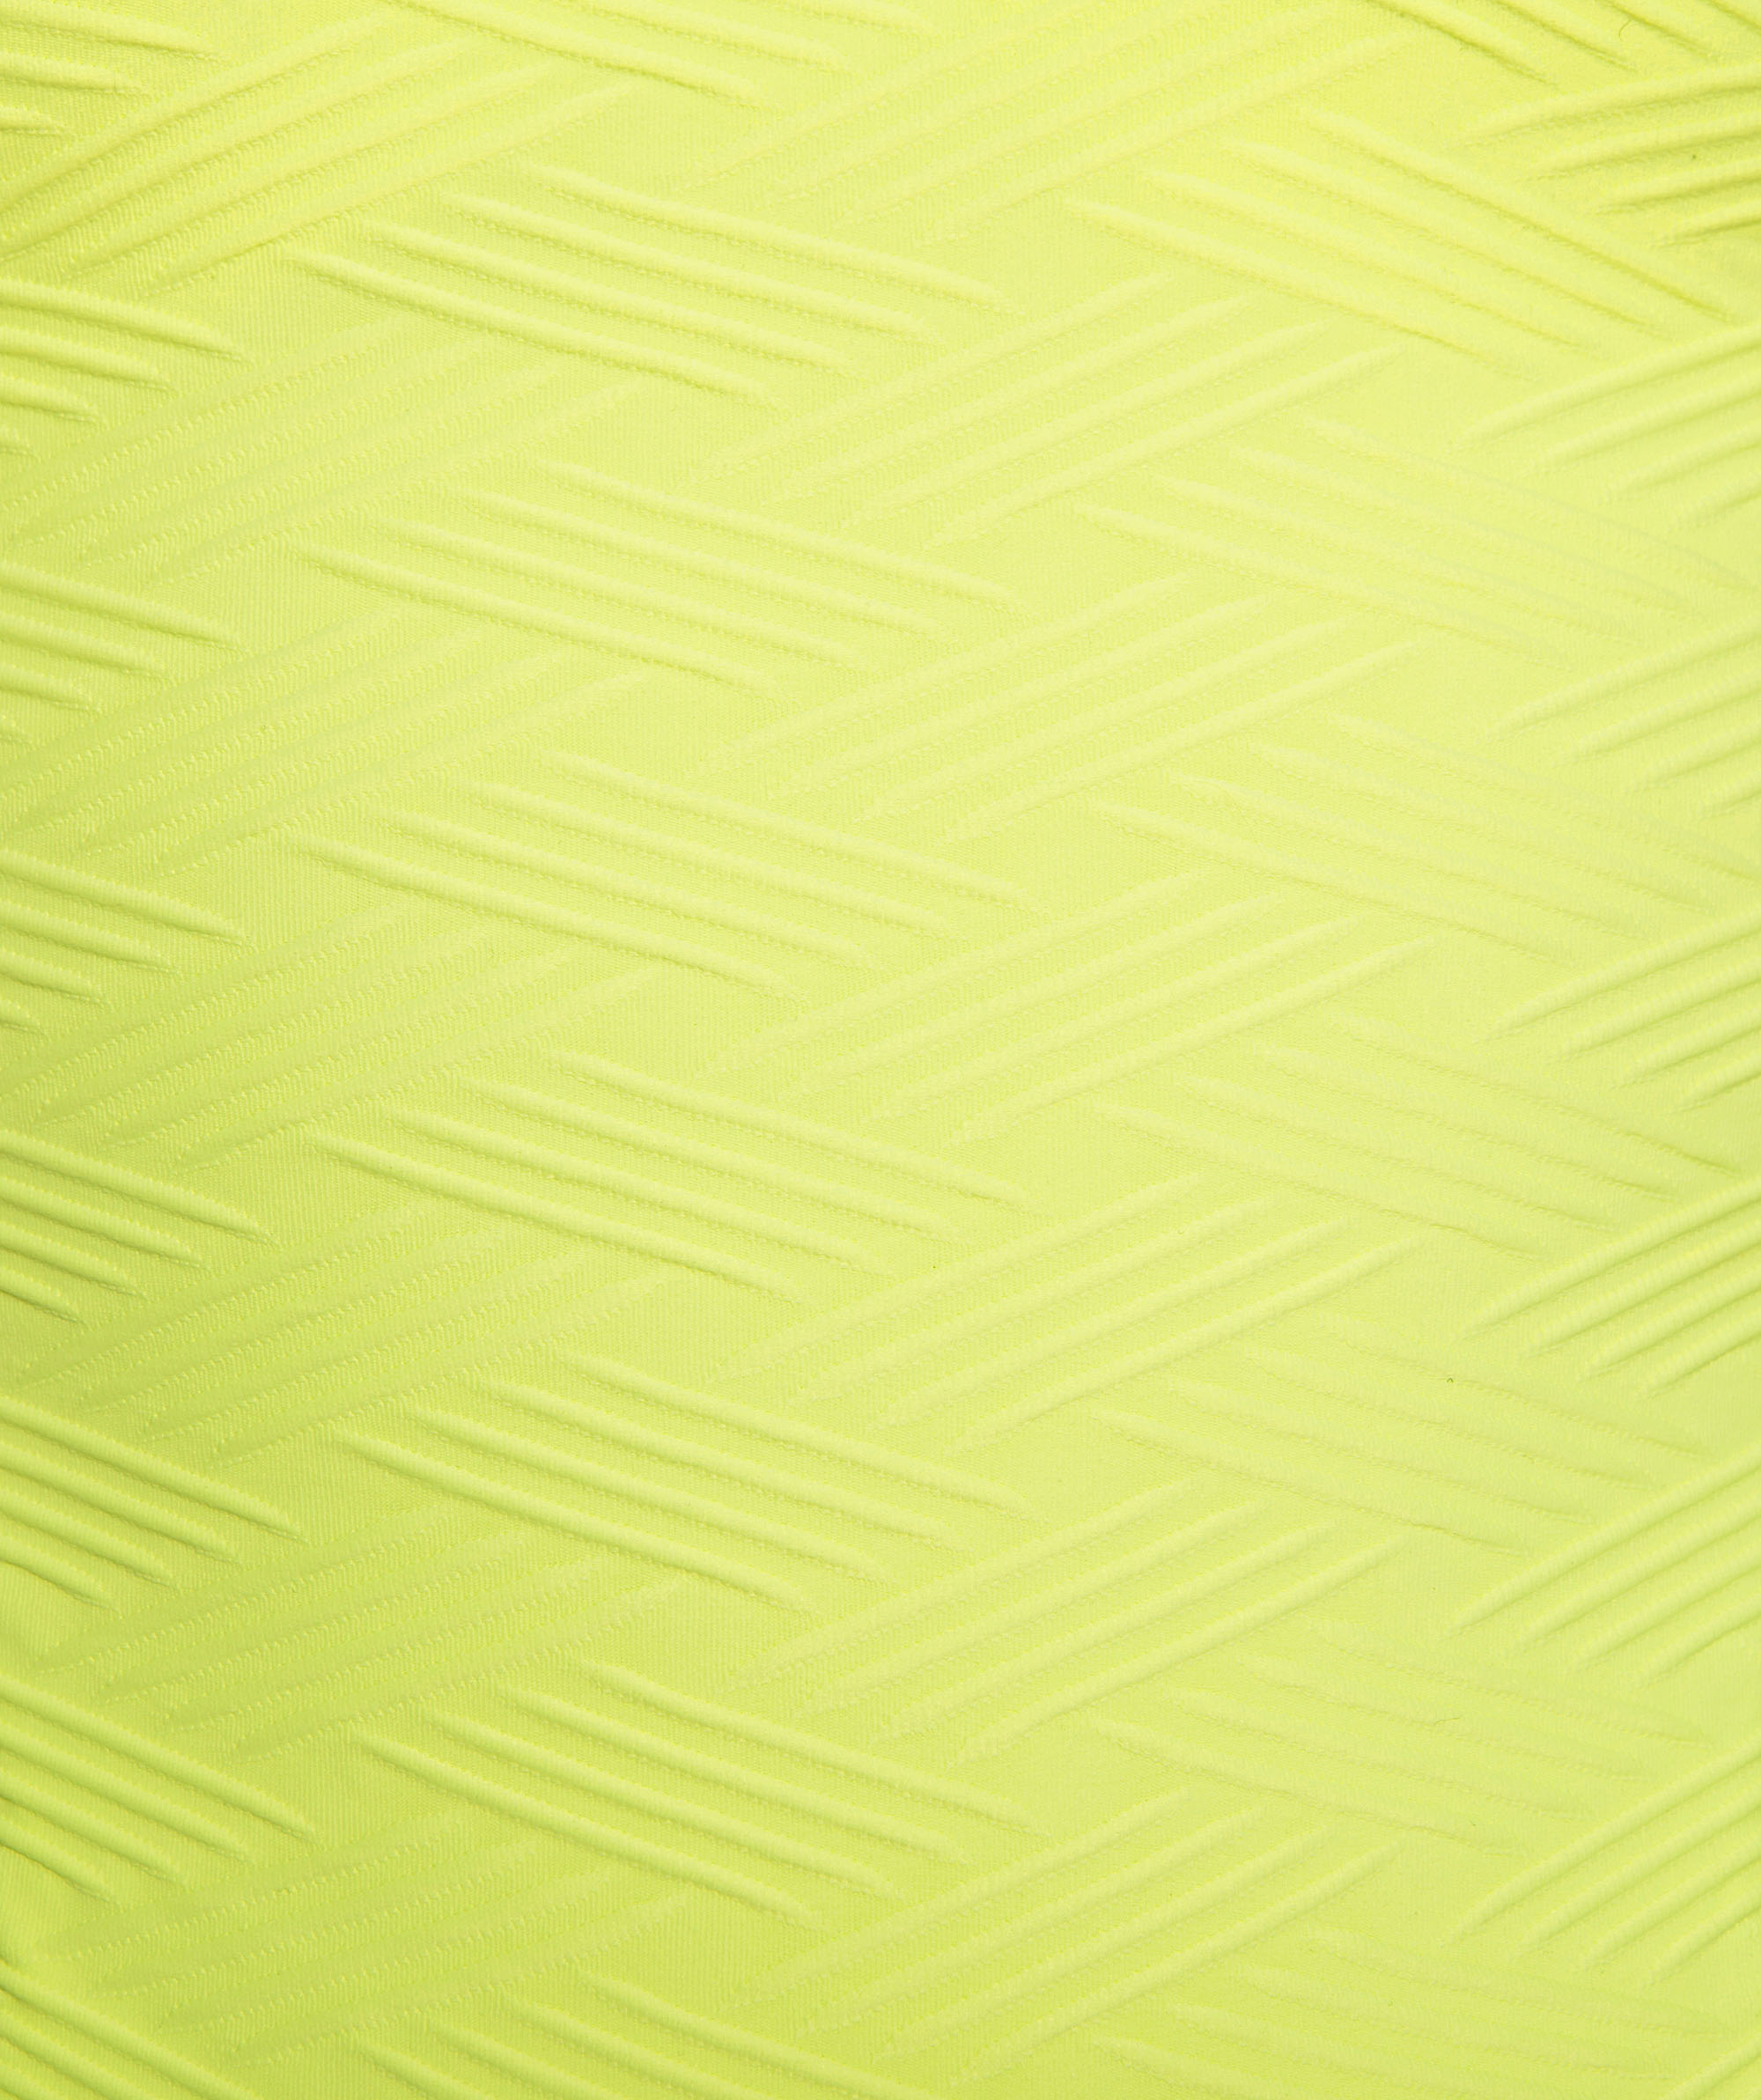 Vamp Vixen Plunge One Piece Swimsuit - Light Yellow